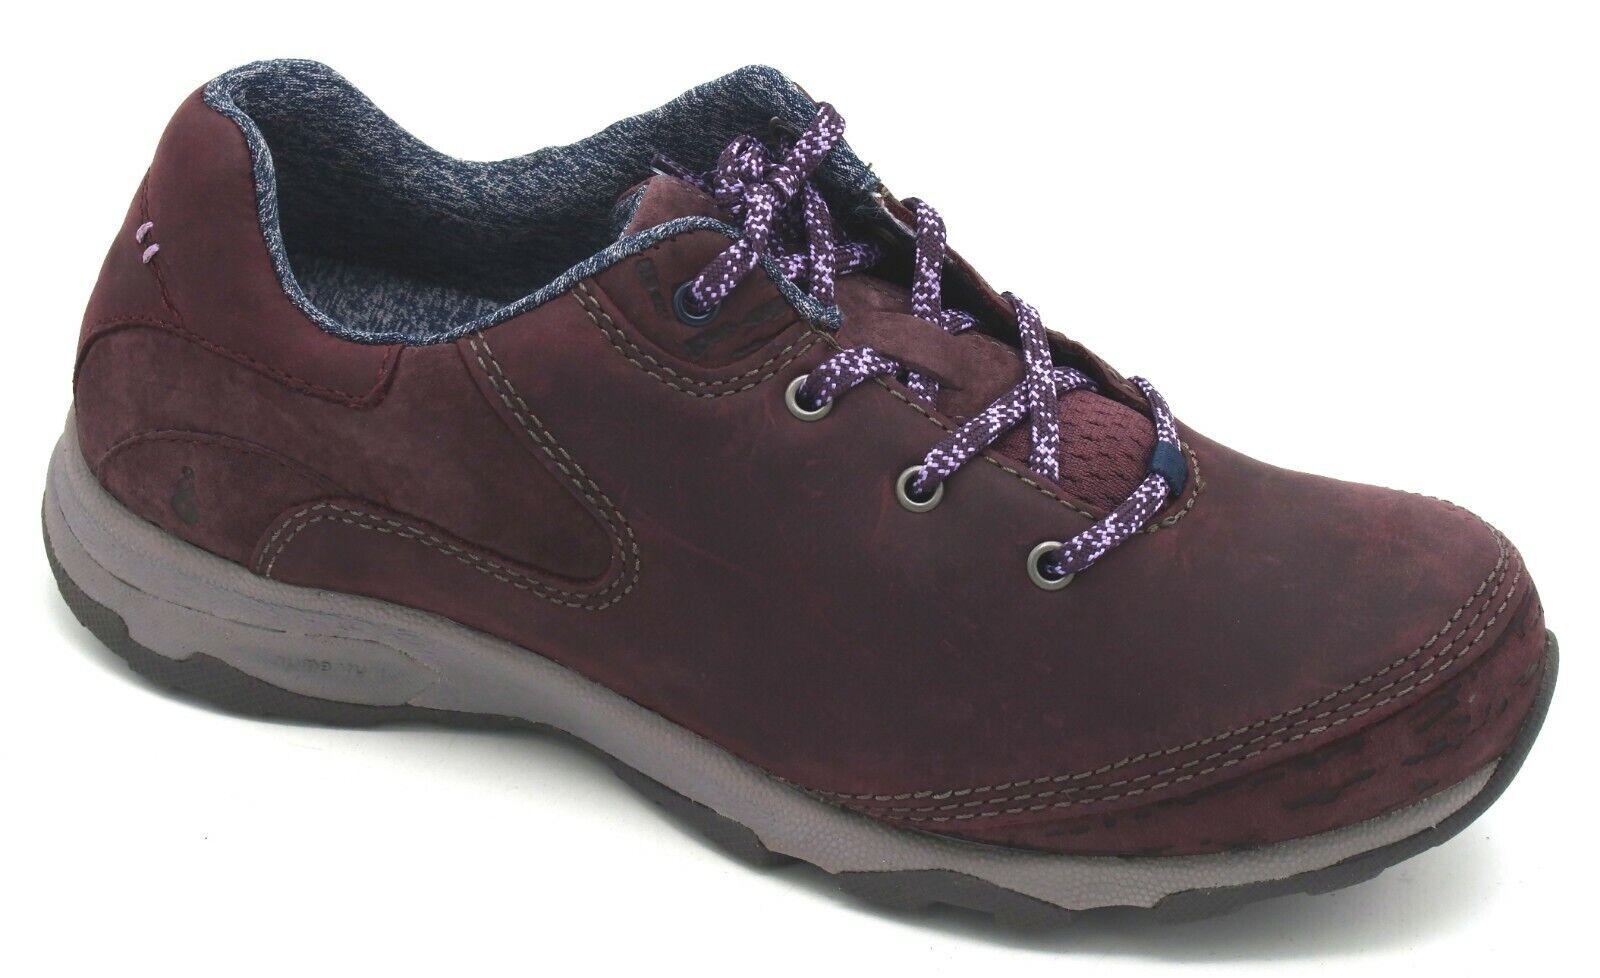 J8035 New Womens Ahnu Sugar Venture Leather Lace Up Walking shoes Dark Plum 7.5 M